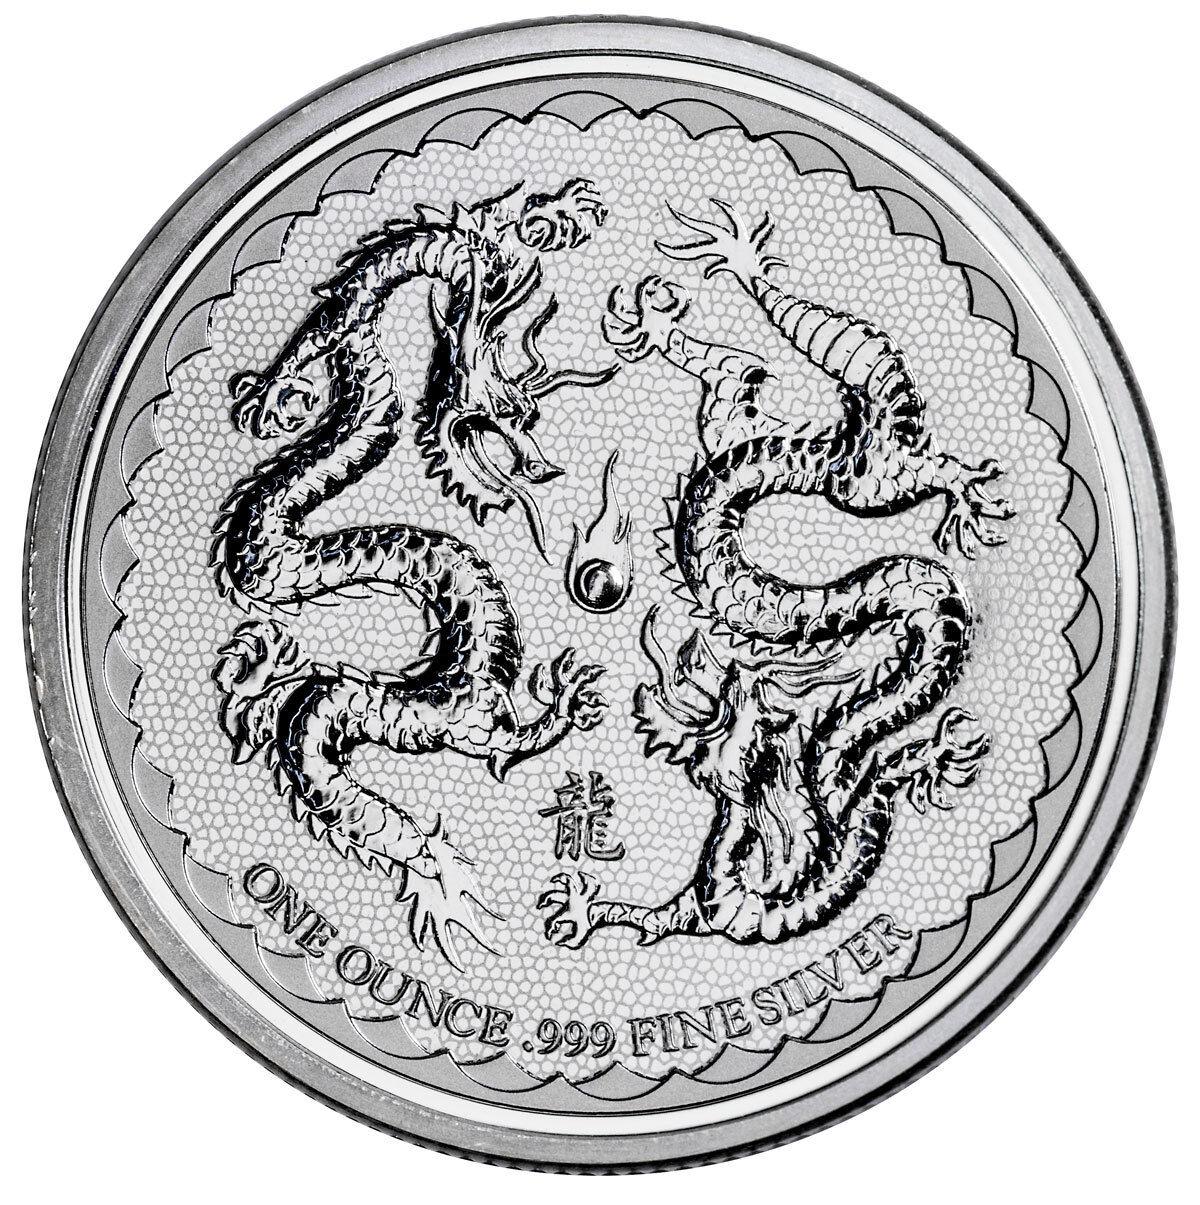 2018 Niue 1 oz Silver Double Dragon - Pearl of Wisdom $2 Coin GEM BU SKU53653